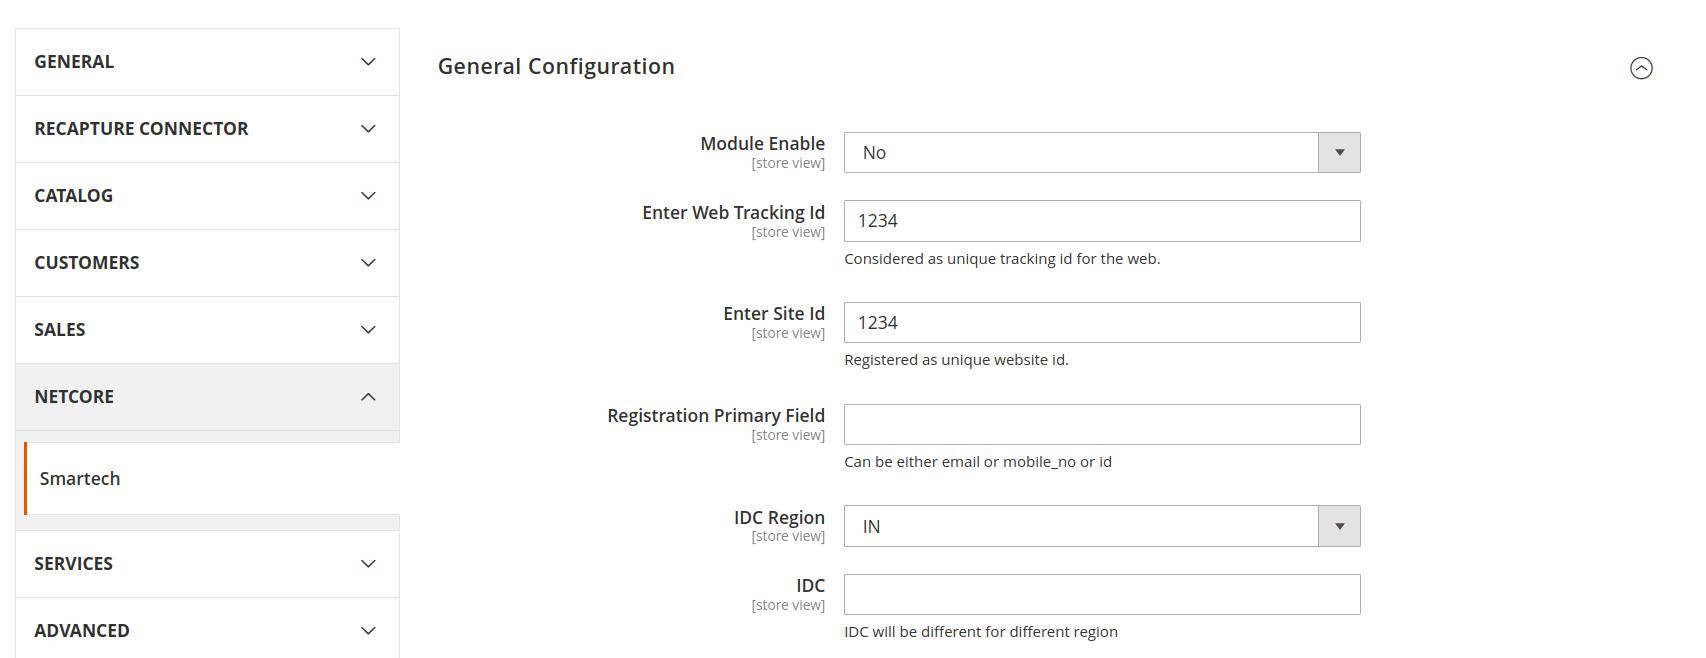 Netcore configuration for described features